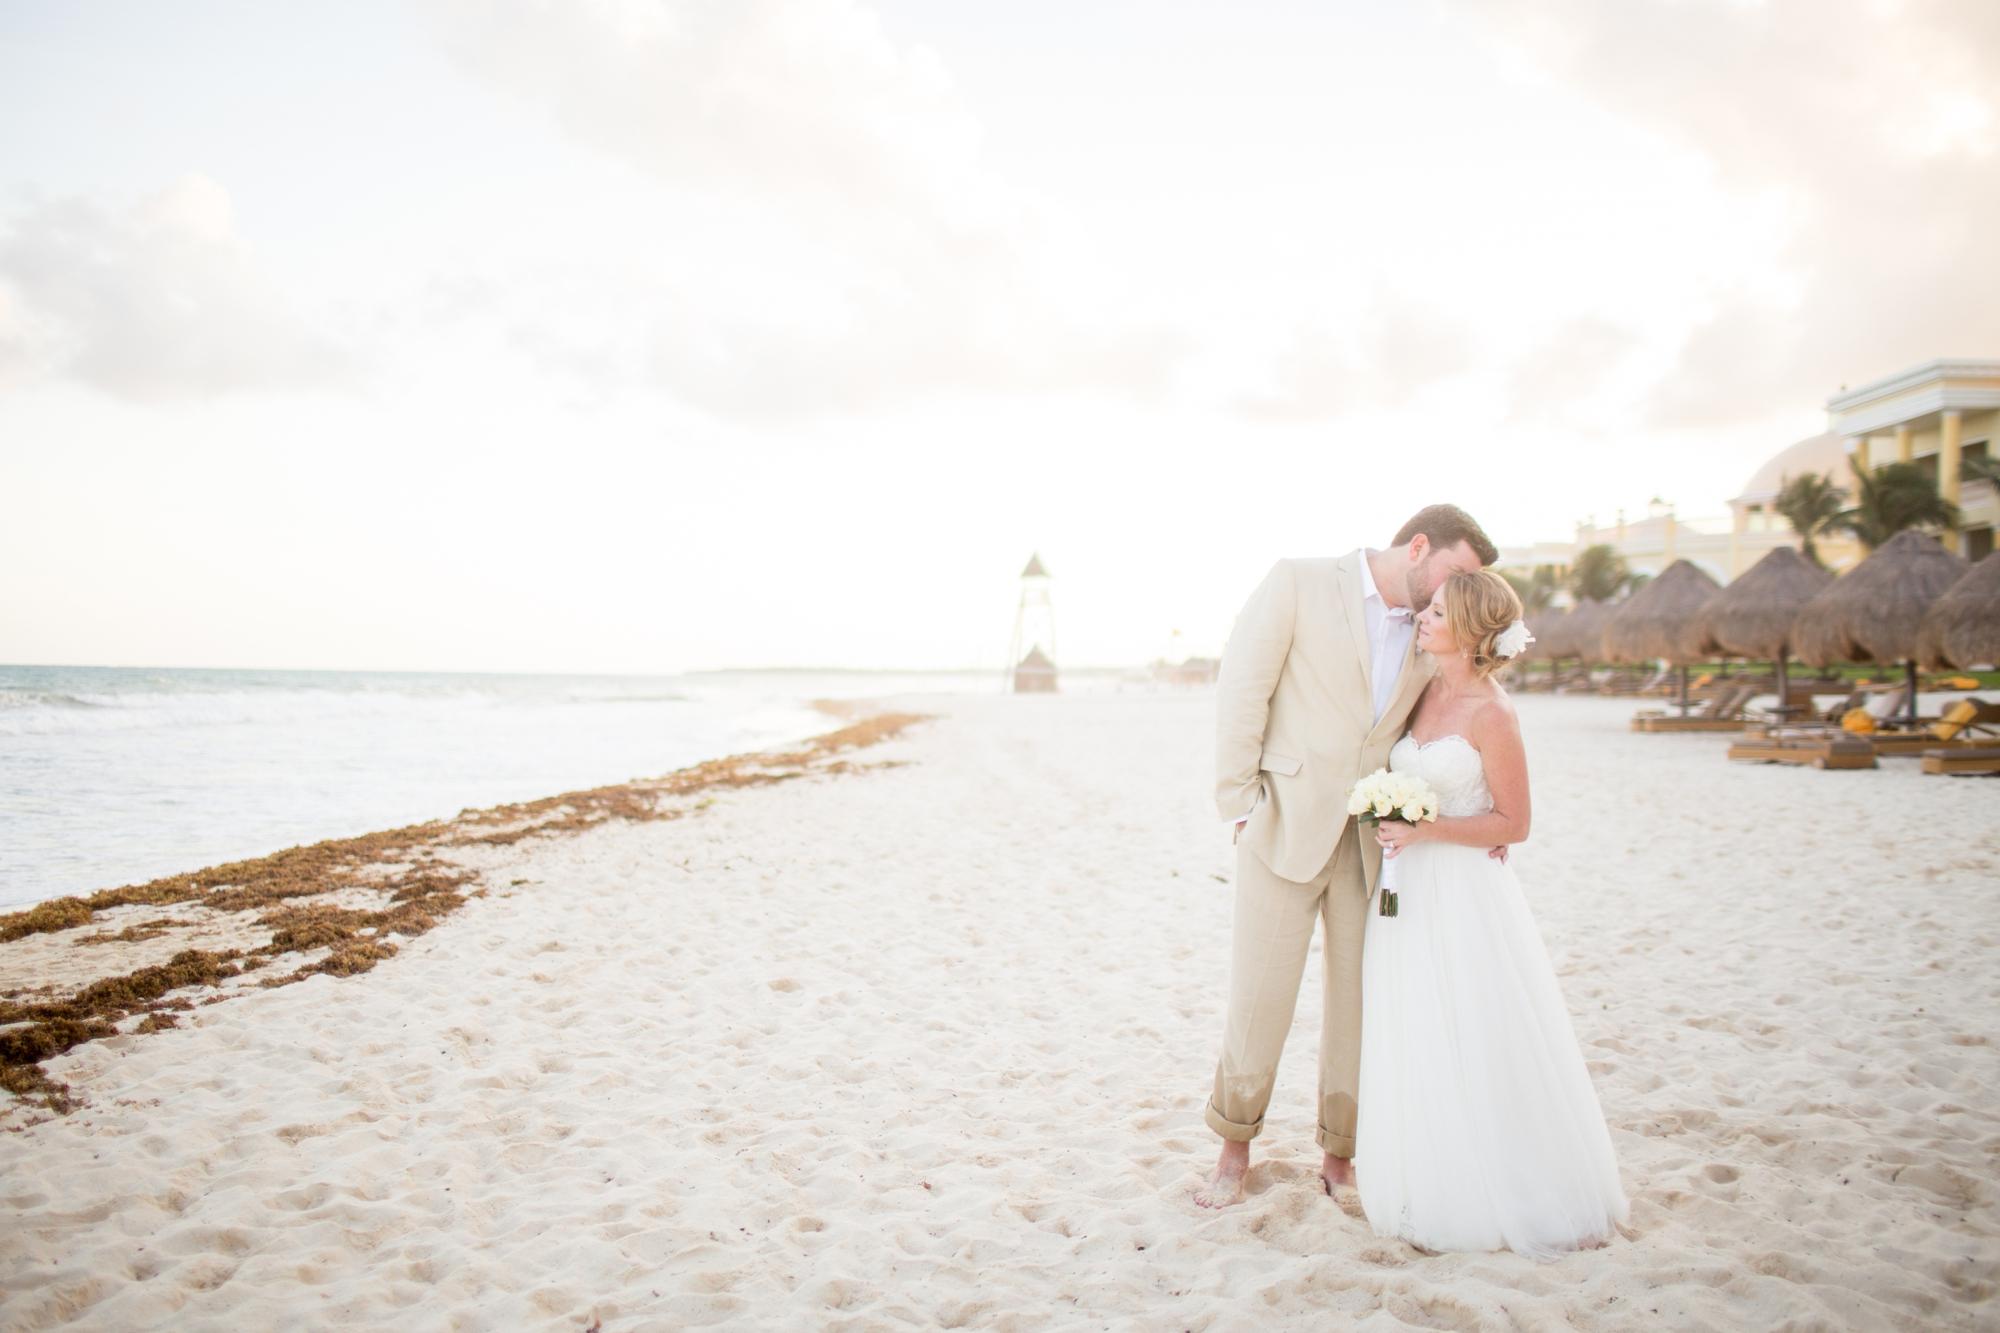 Morosoff Wedding 4-Bride & Groom Portraits-506_anna grace photography destination wedding photographer playa del carmen mexico photo.jpg